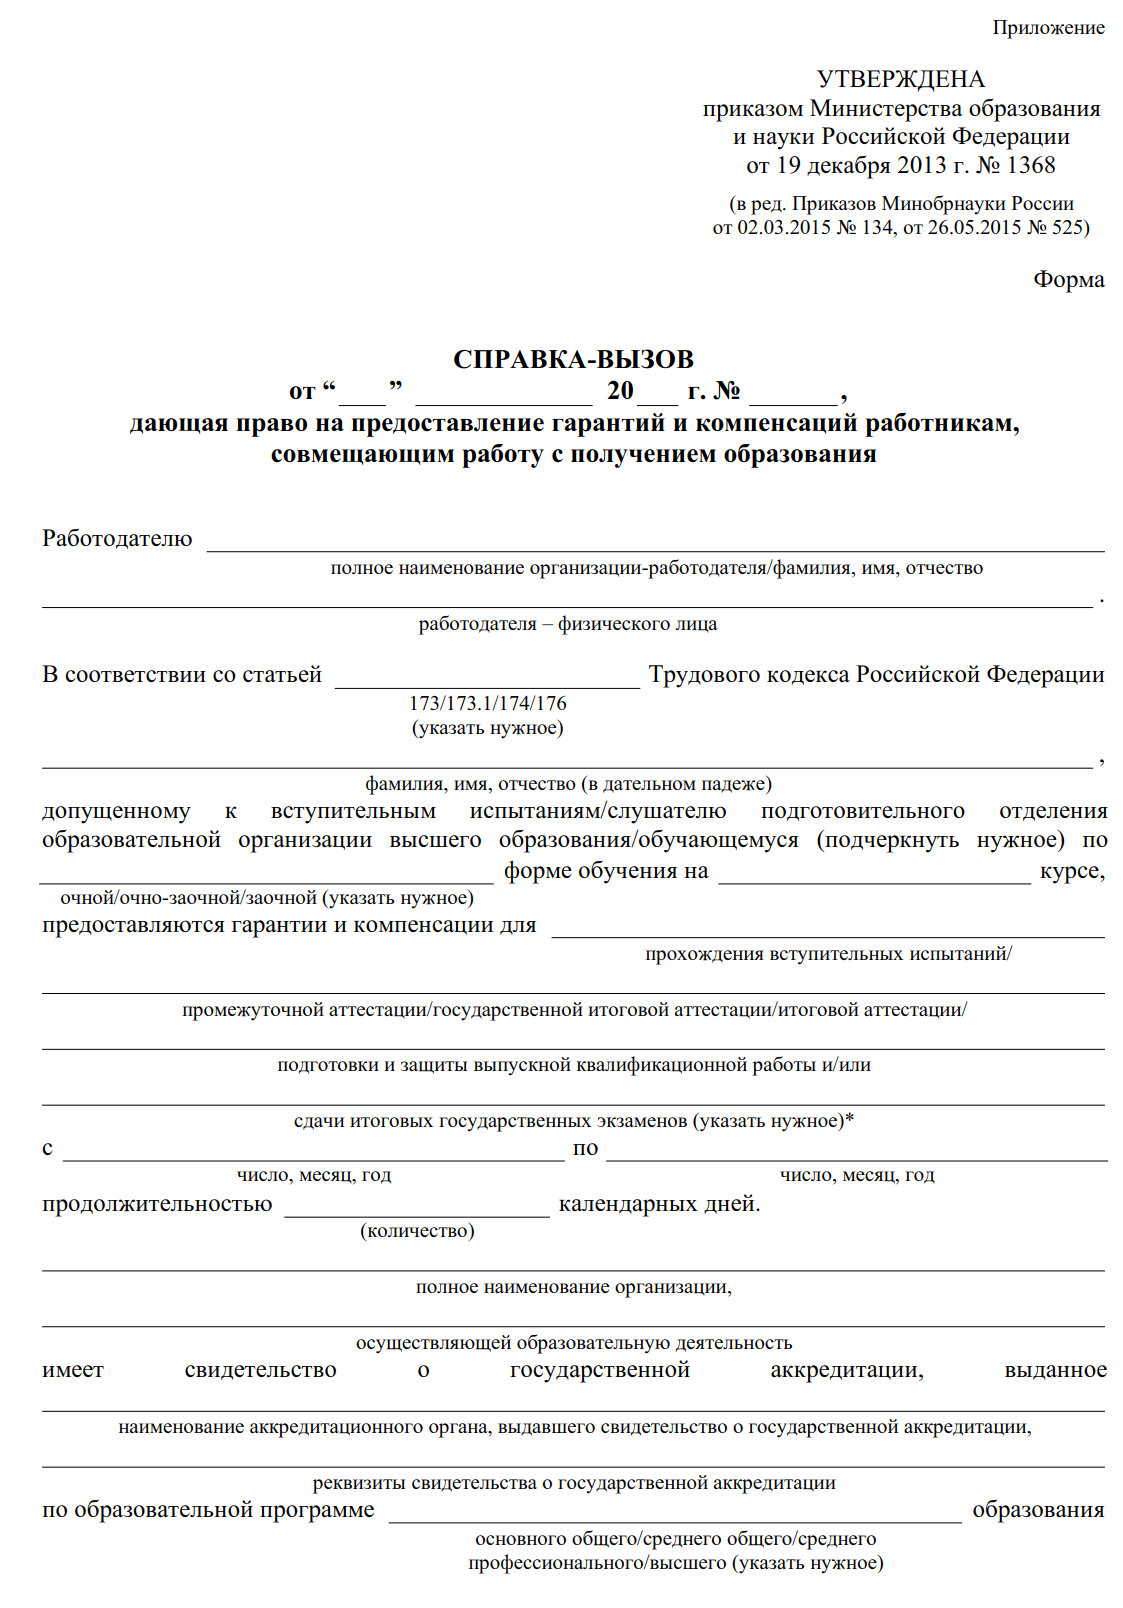 spravka-vyzov-s-1.png